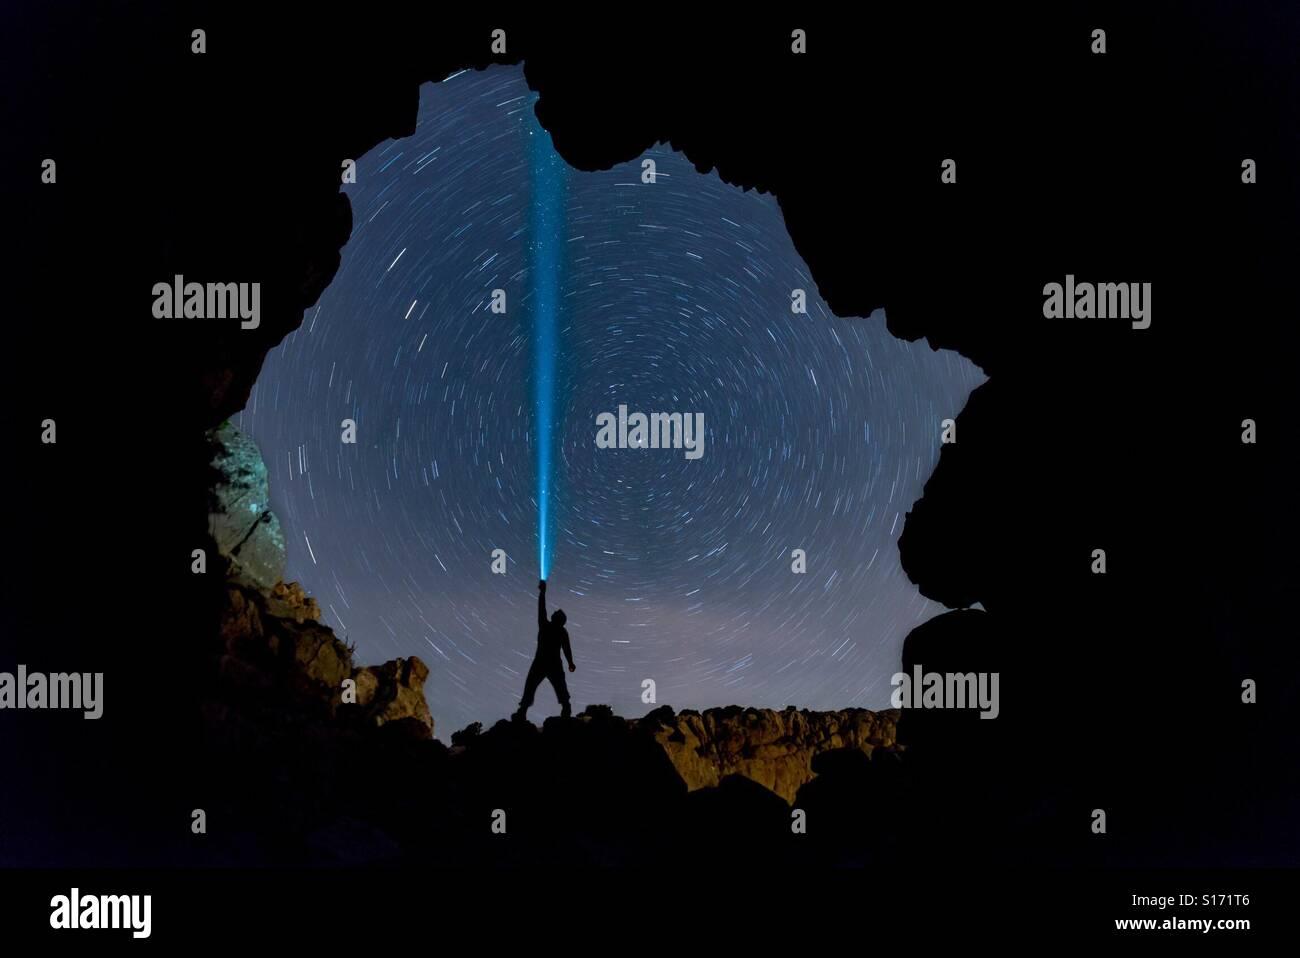 Sterne, Nacht und Höhle Stockbild